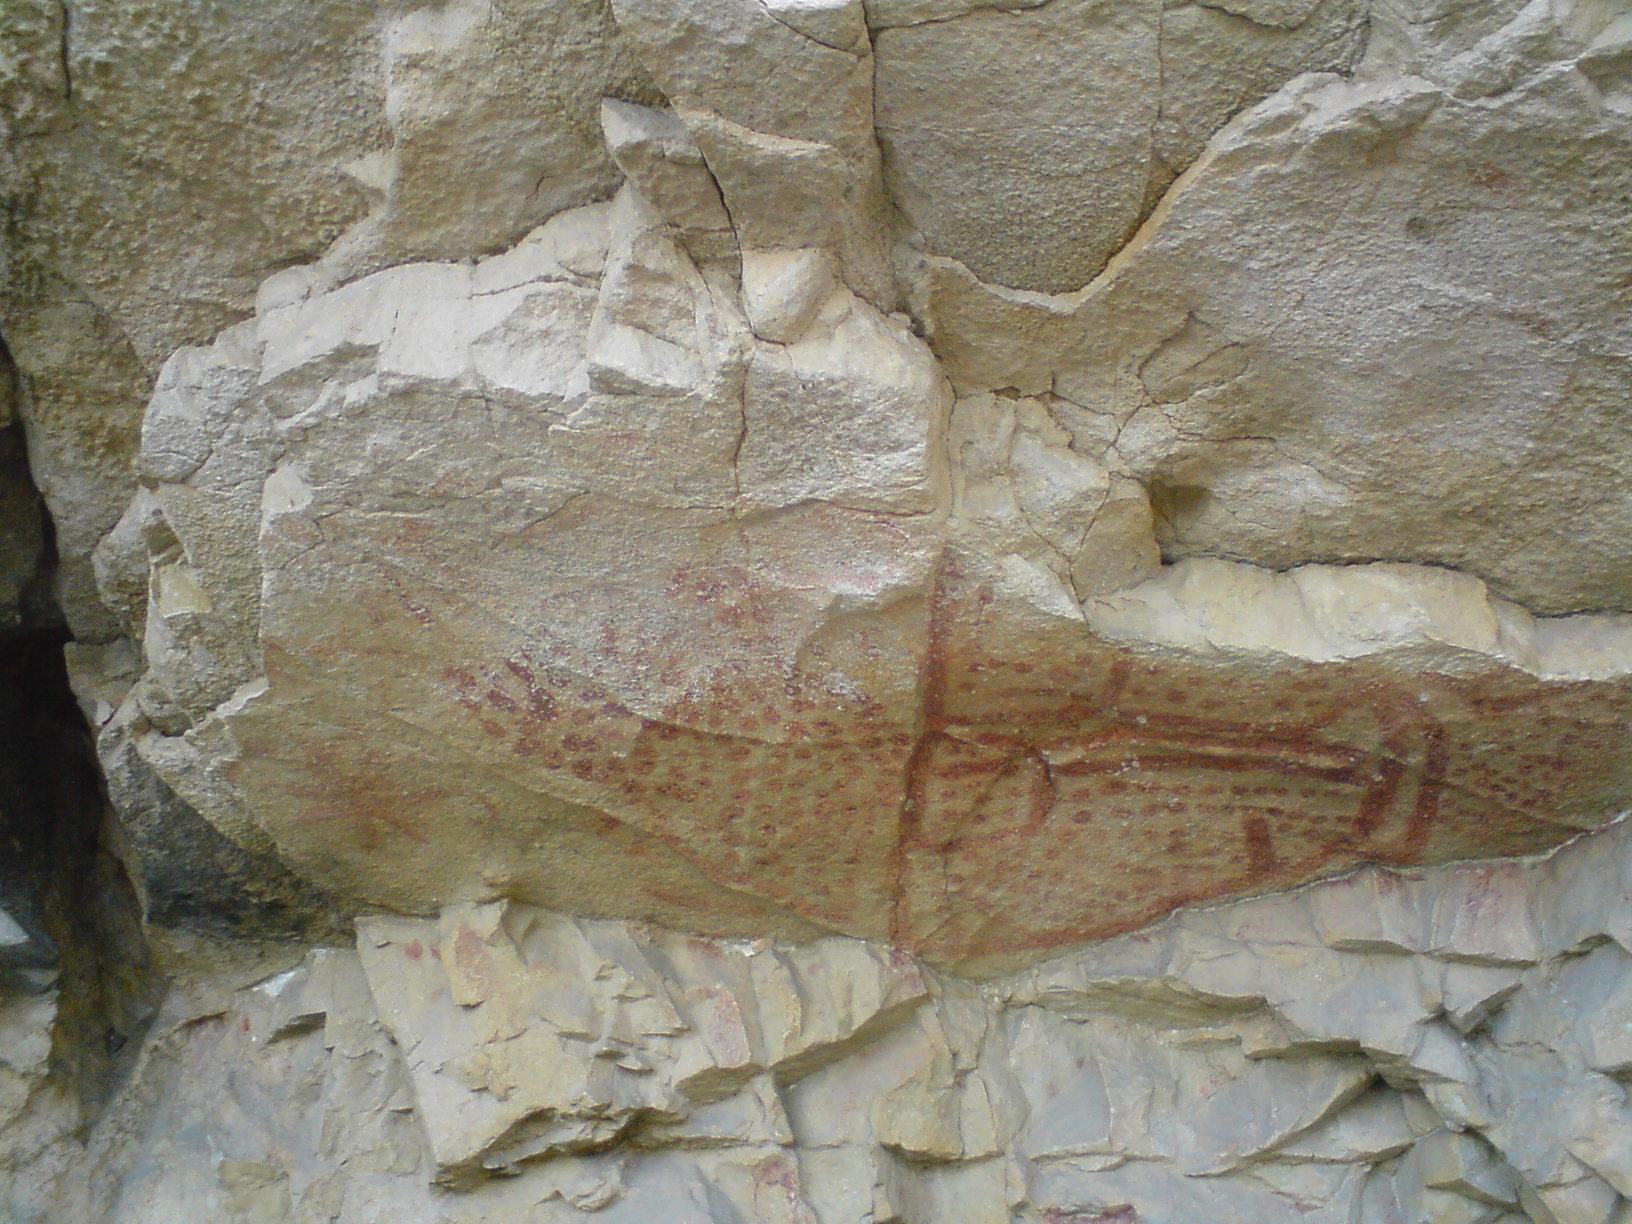 peintures rupestres.JPG